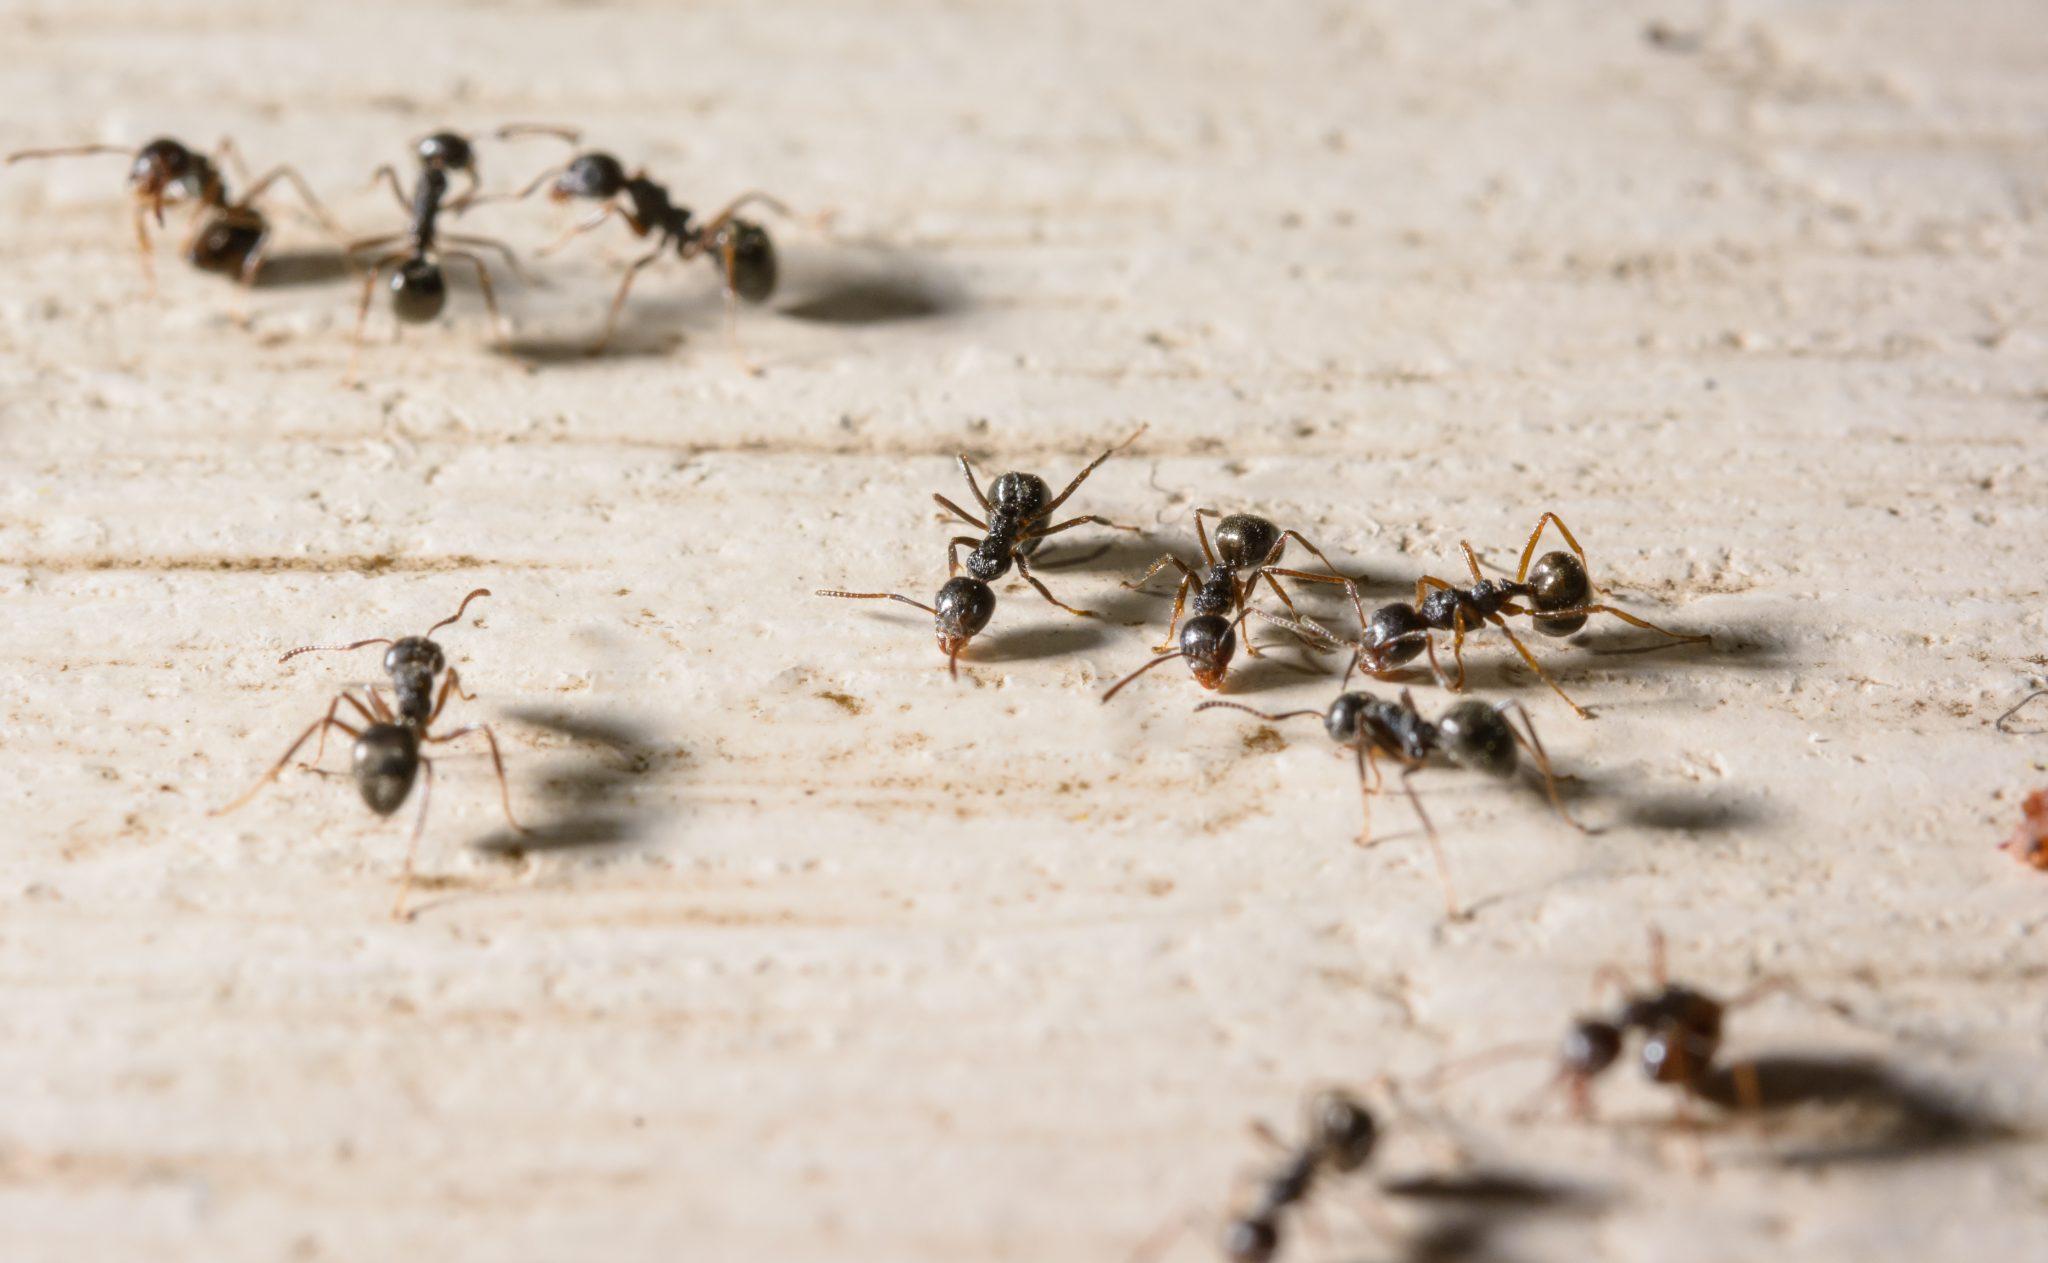 exterminators in Anne Arundel County -- Raven Termite and Pest Control